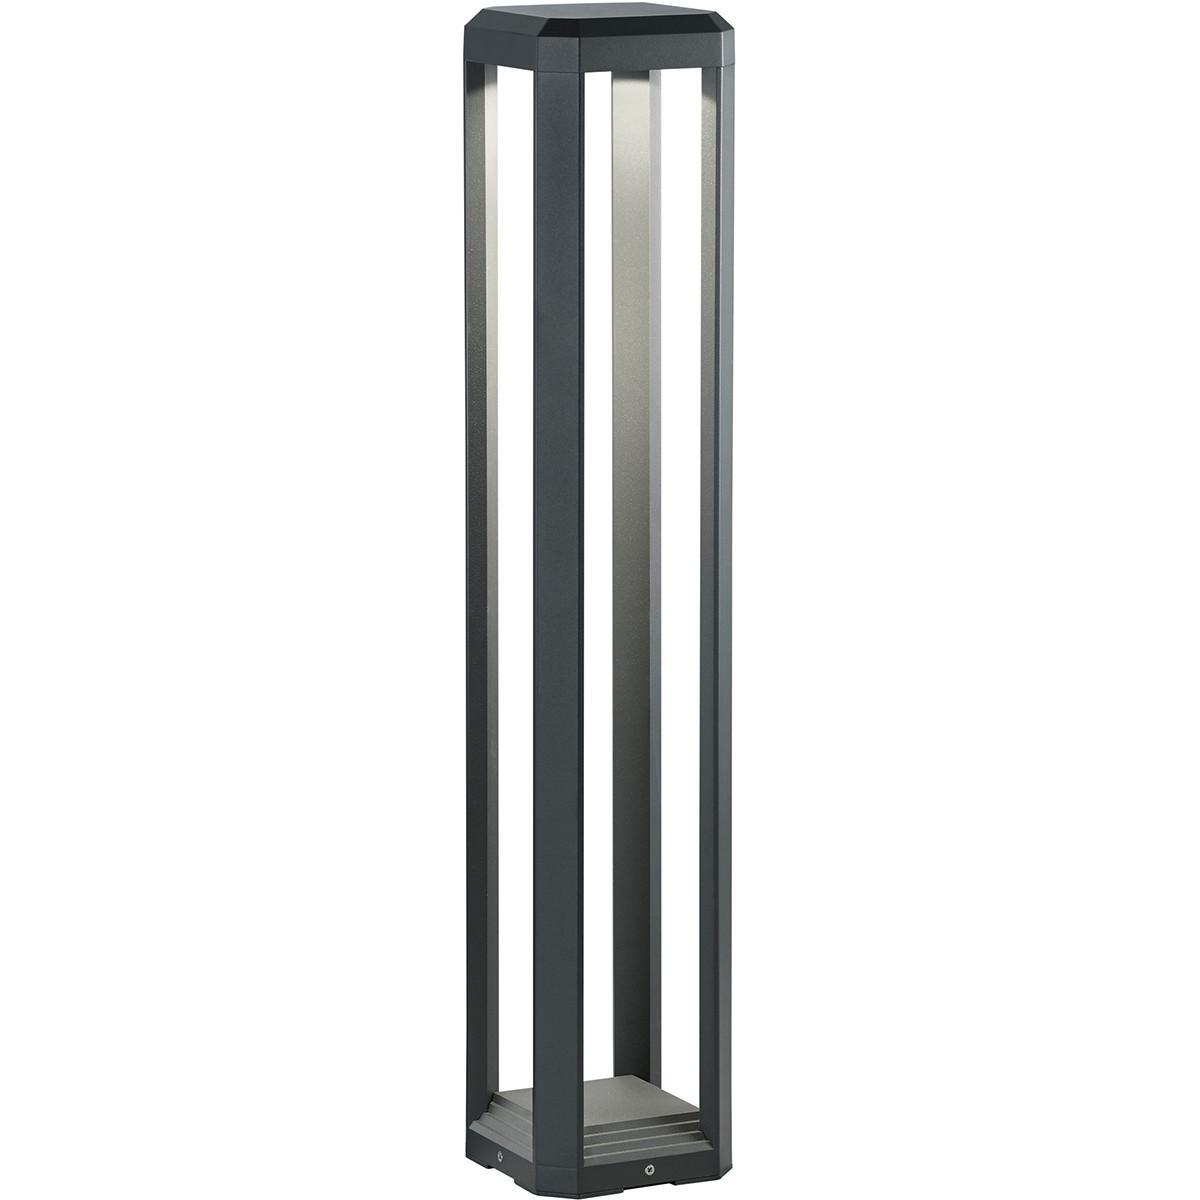 OSRAM - LED Tuinverlichting - Buitenlamp - Trion Logani XL - Staand - 11W - Mat Zwart - Aluminium